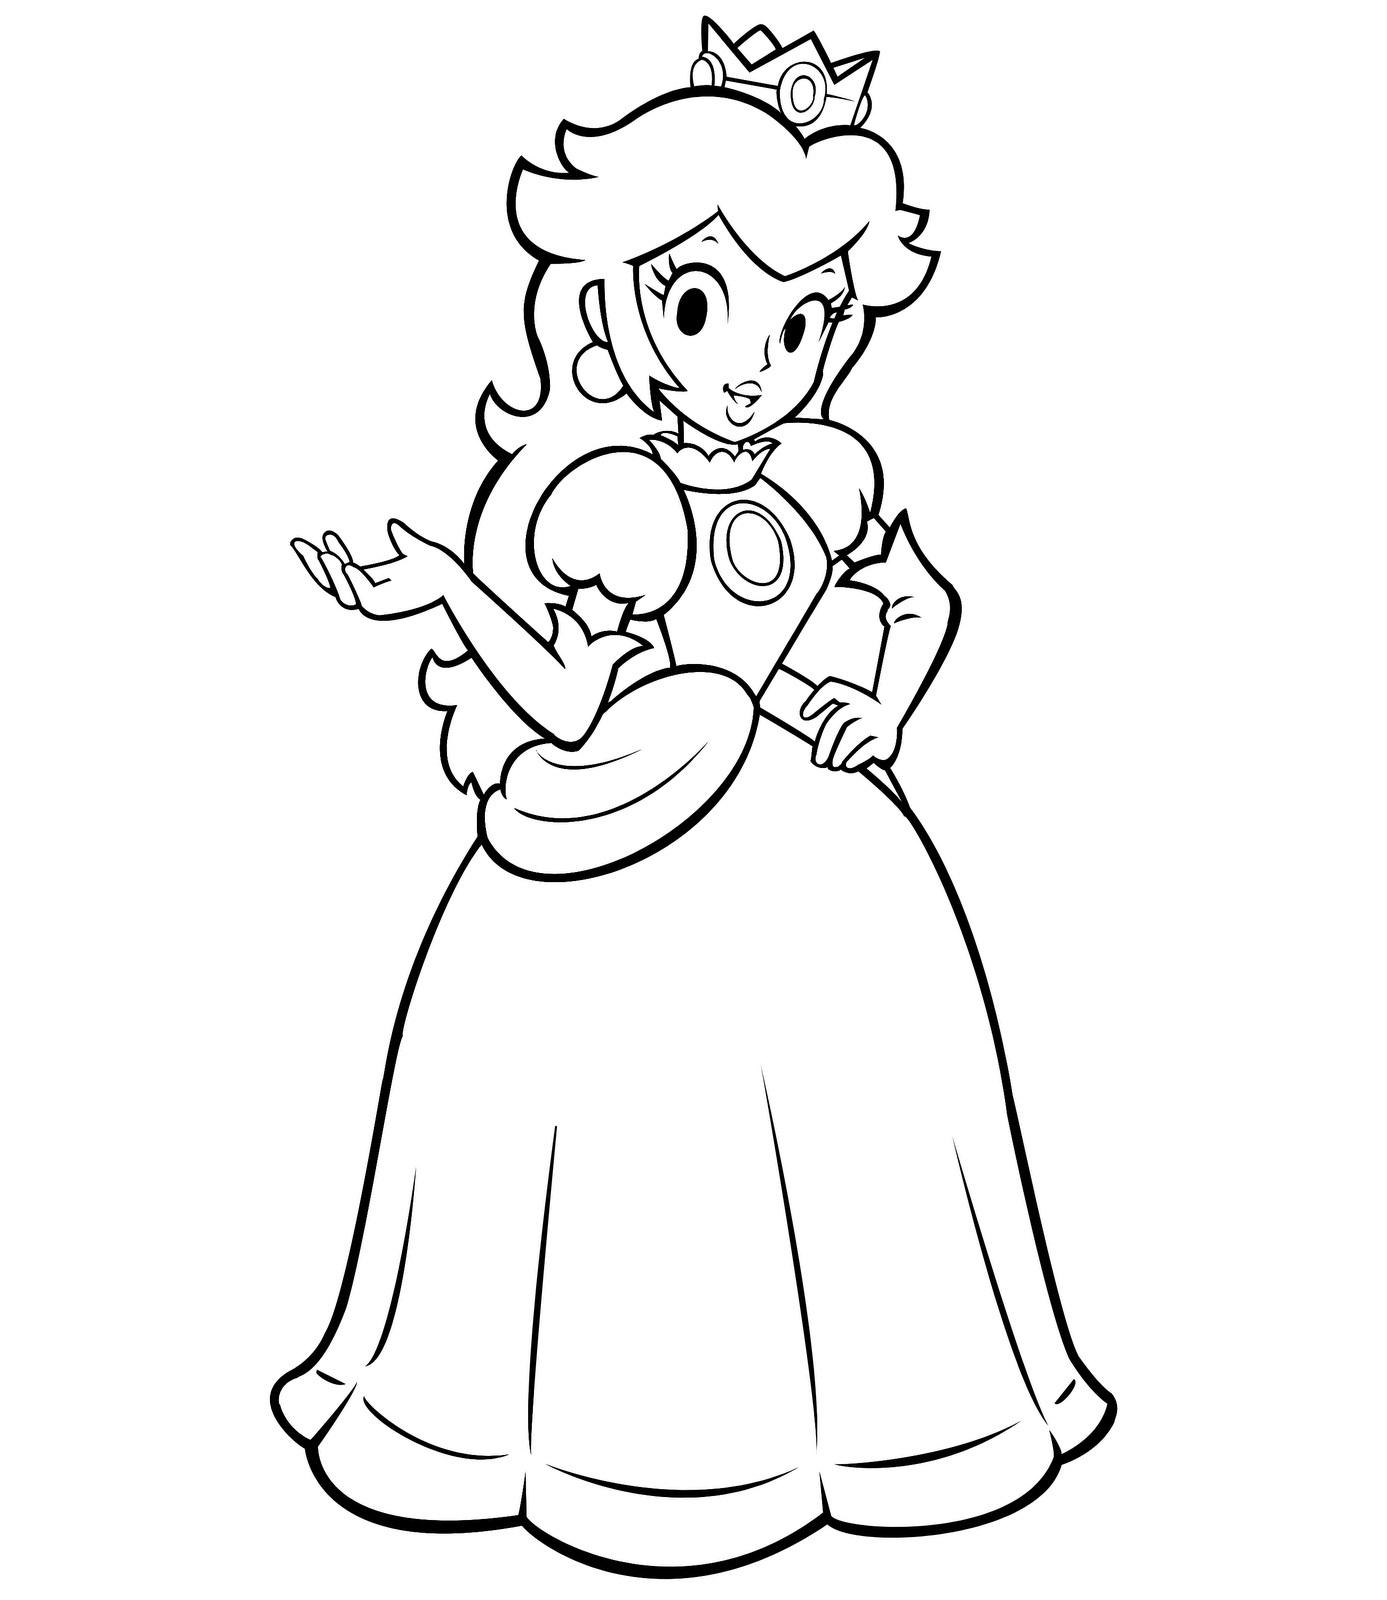 Peach coloring #8, Download drawings